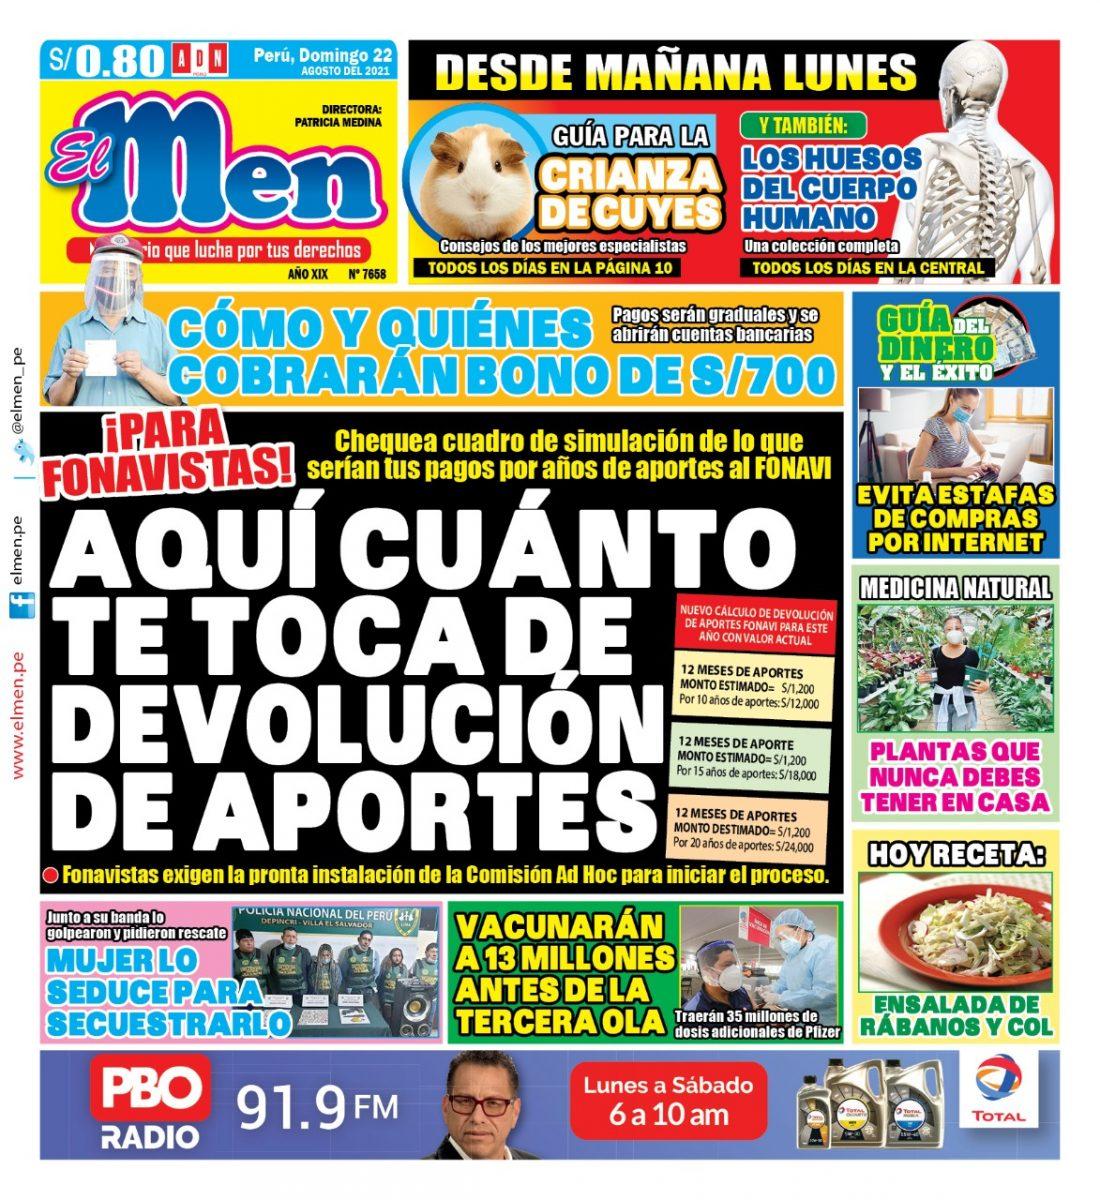 Portada impresa – Diario El Men (22/08/2021)